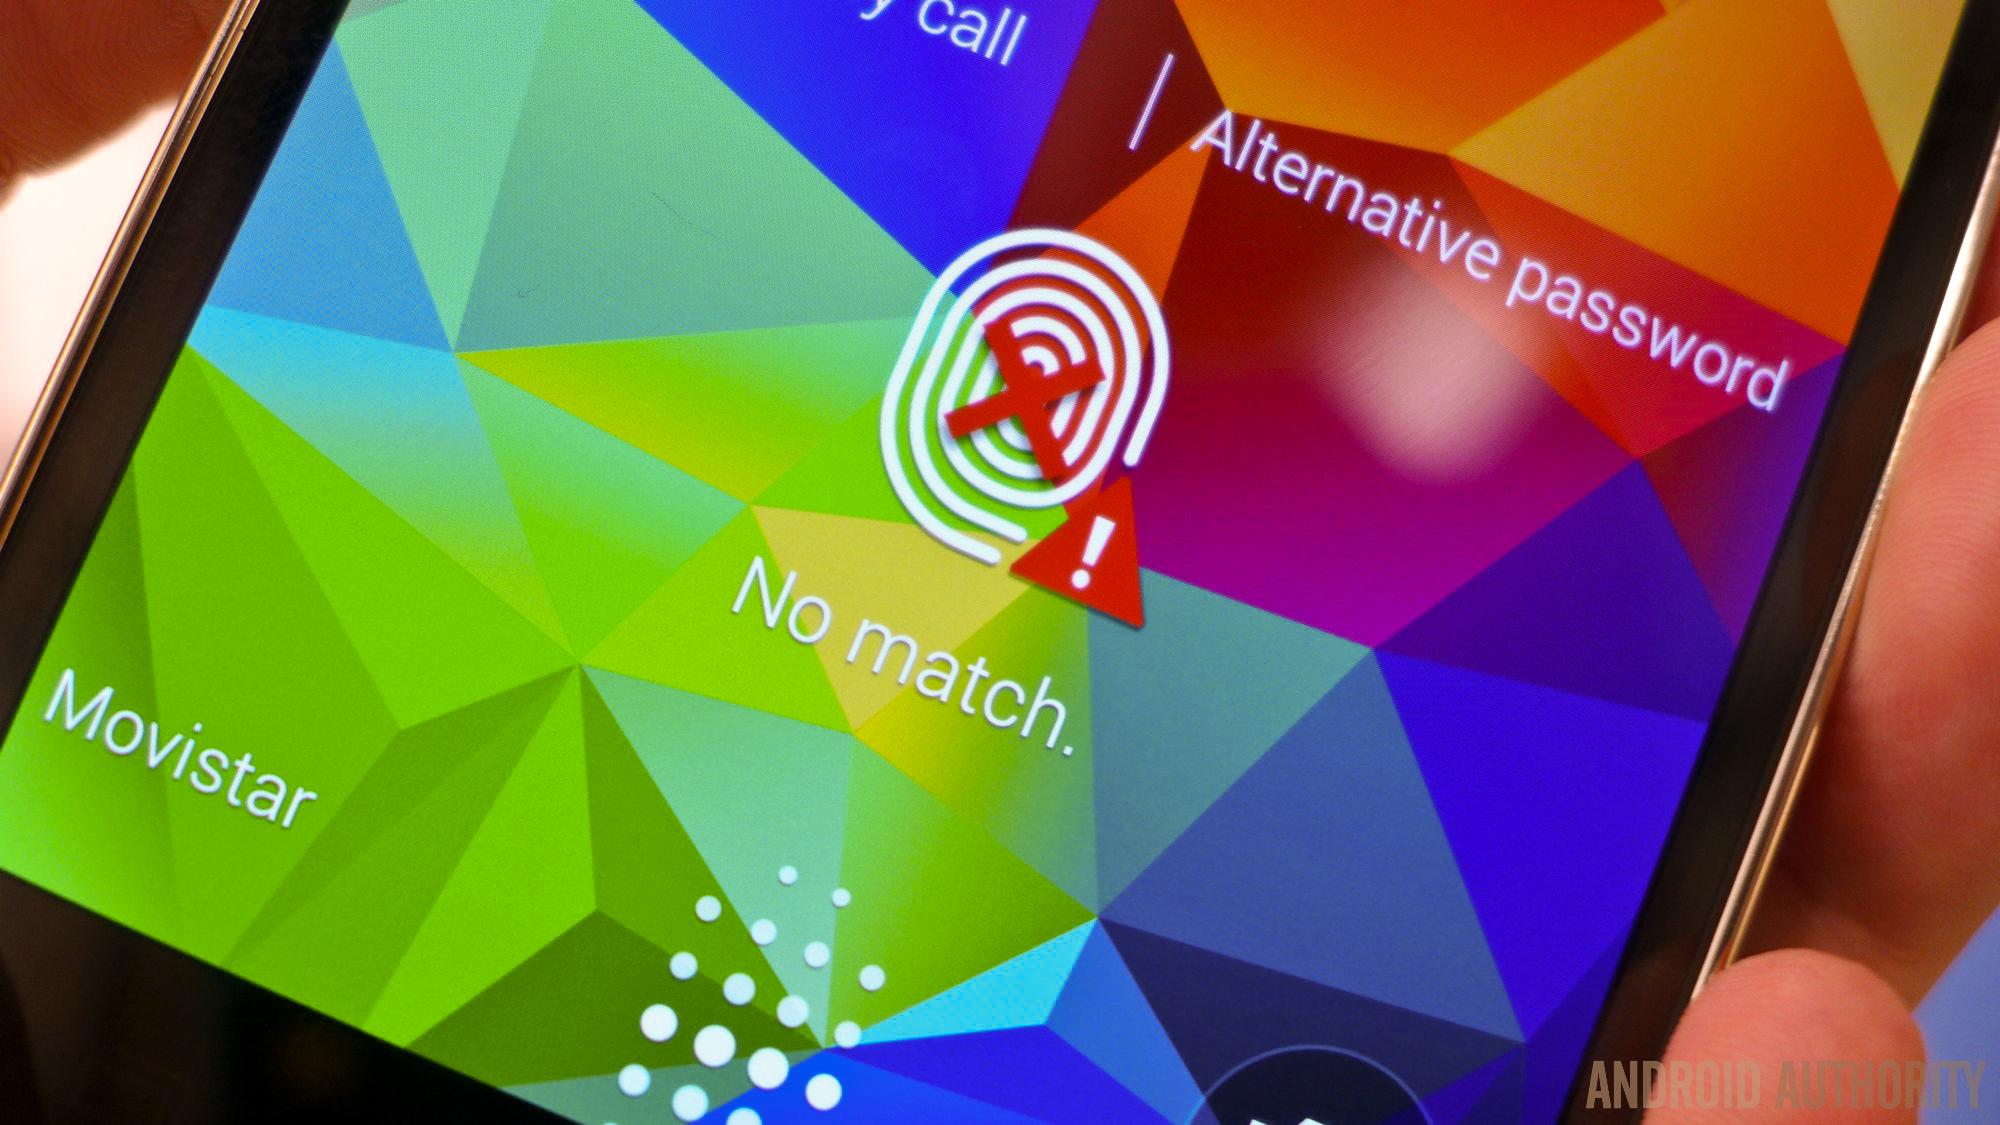 samsung galaxy s5 fingerprint sensor scanner security